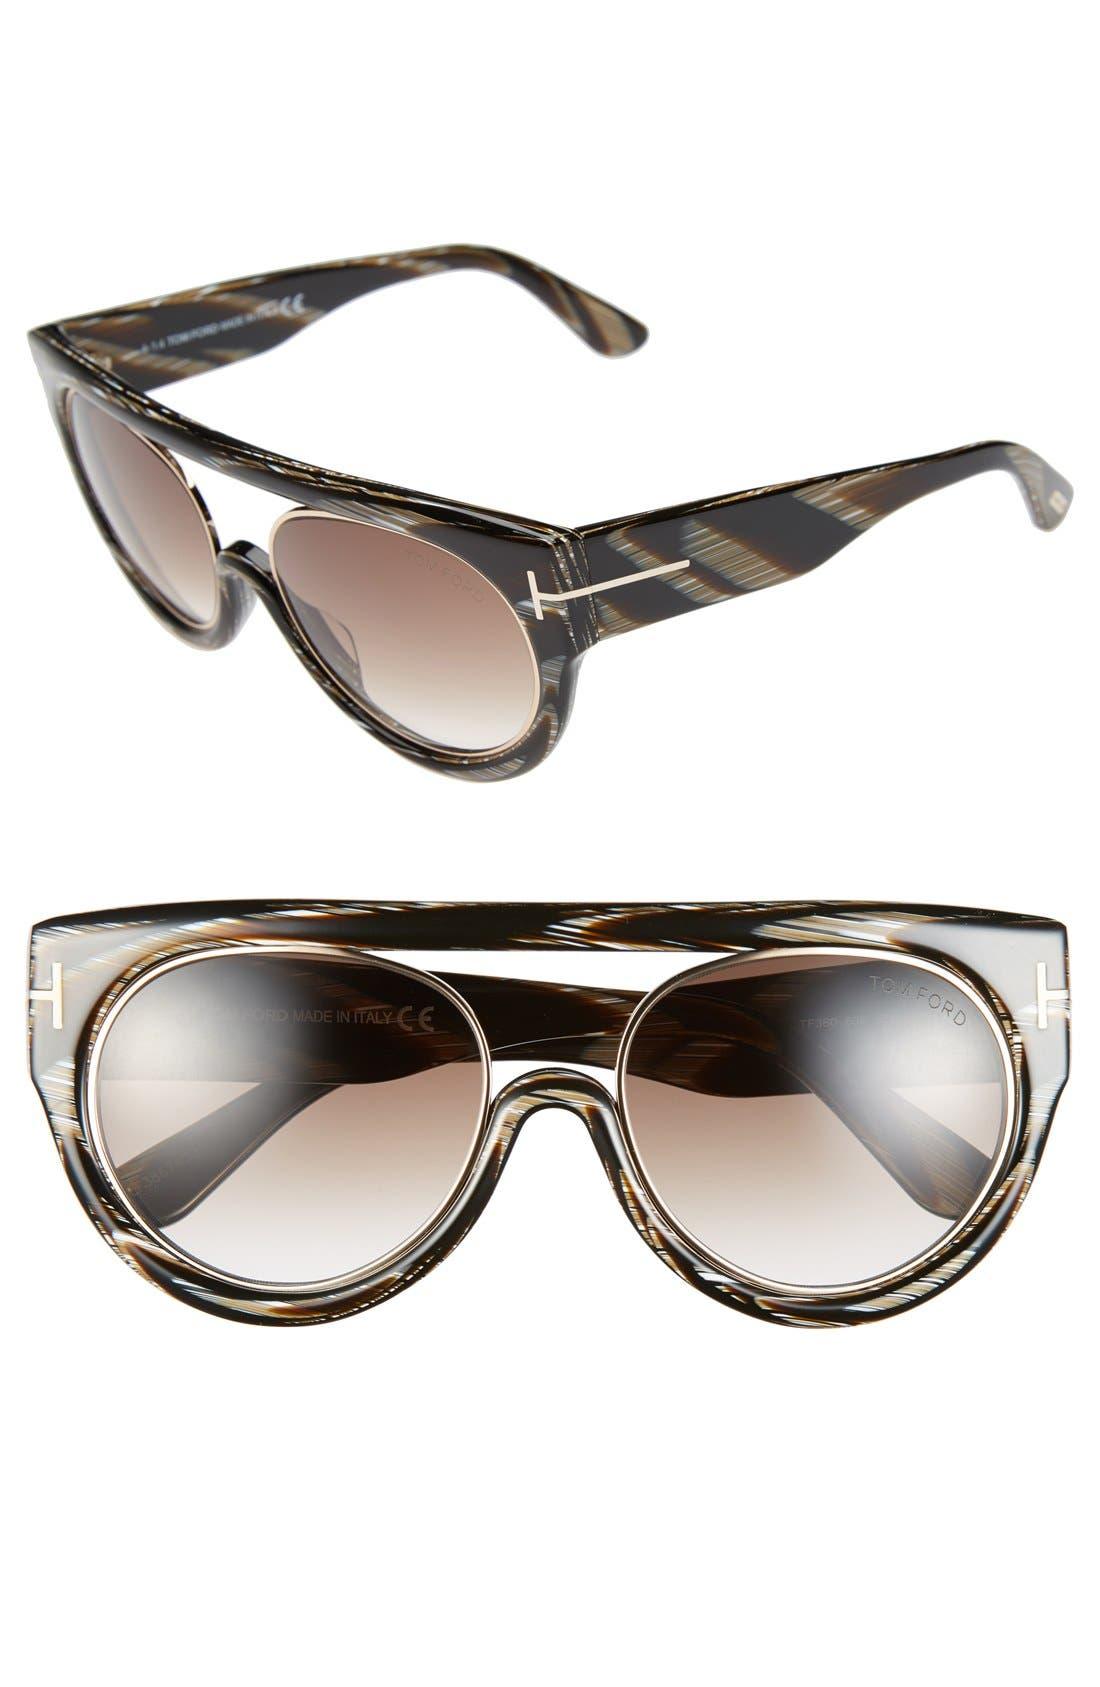 Tom Ford Sonnenbrille Alana (55 mm) schwarz mcP63mmr